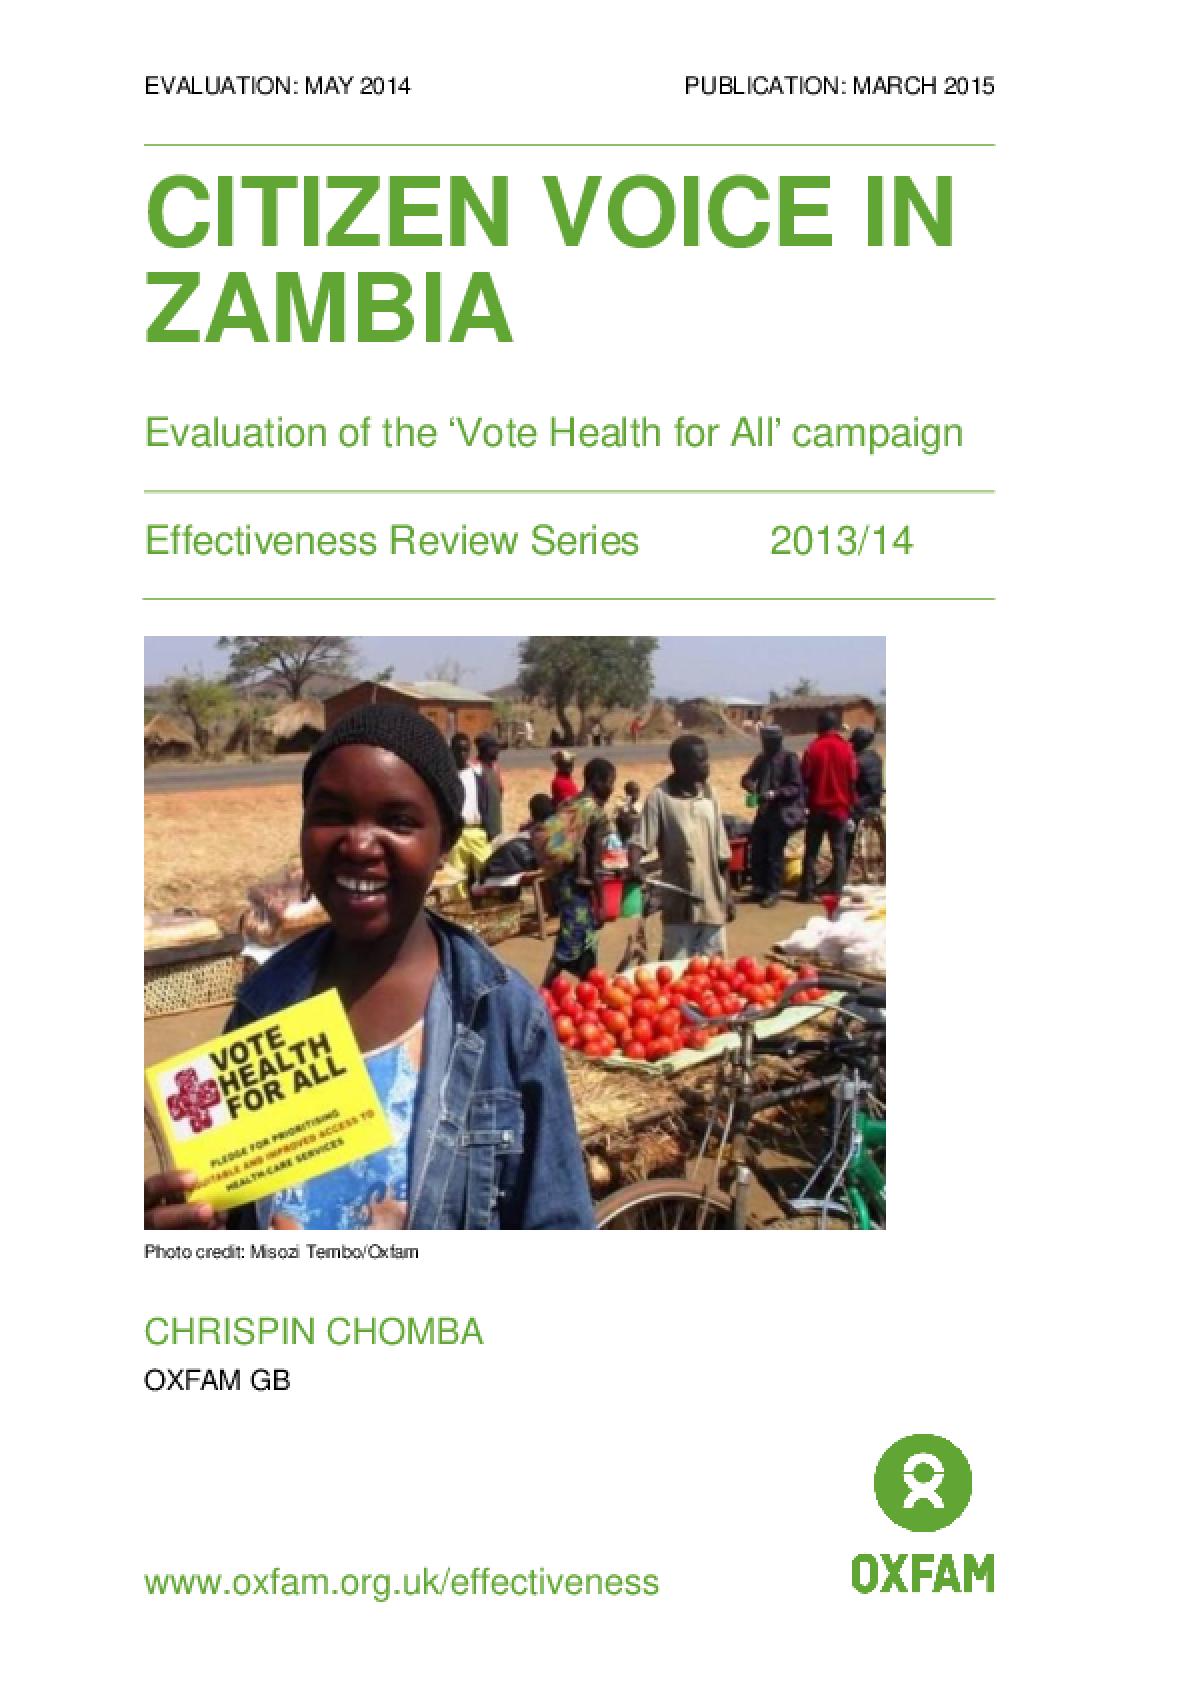 Citizen Voice in Zambia: Evaluation of the 'Vote Health for All' campaign